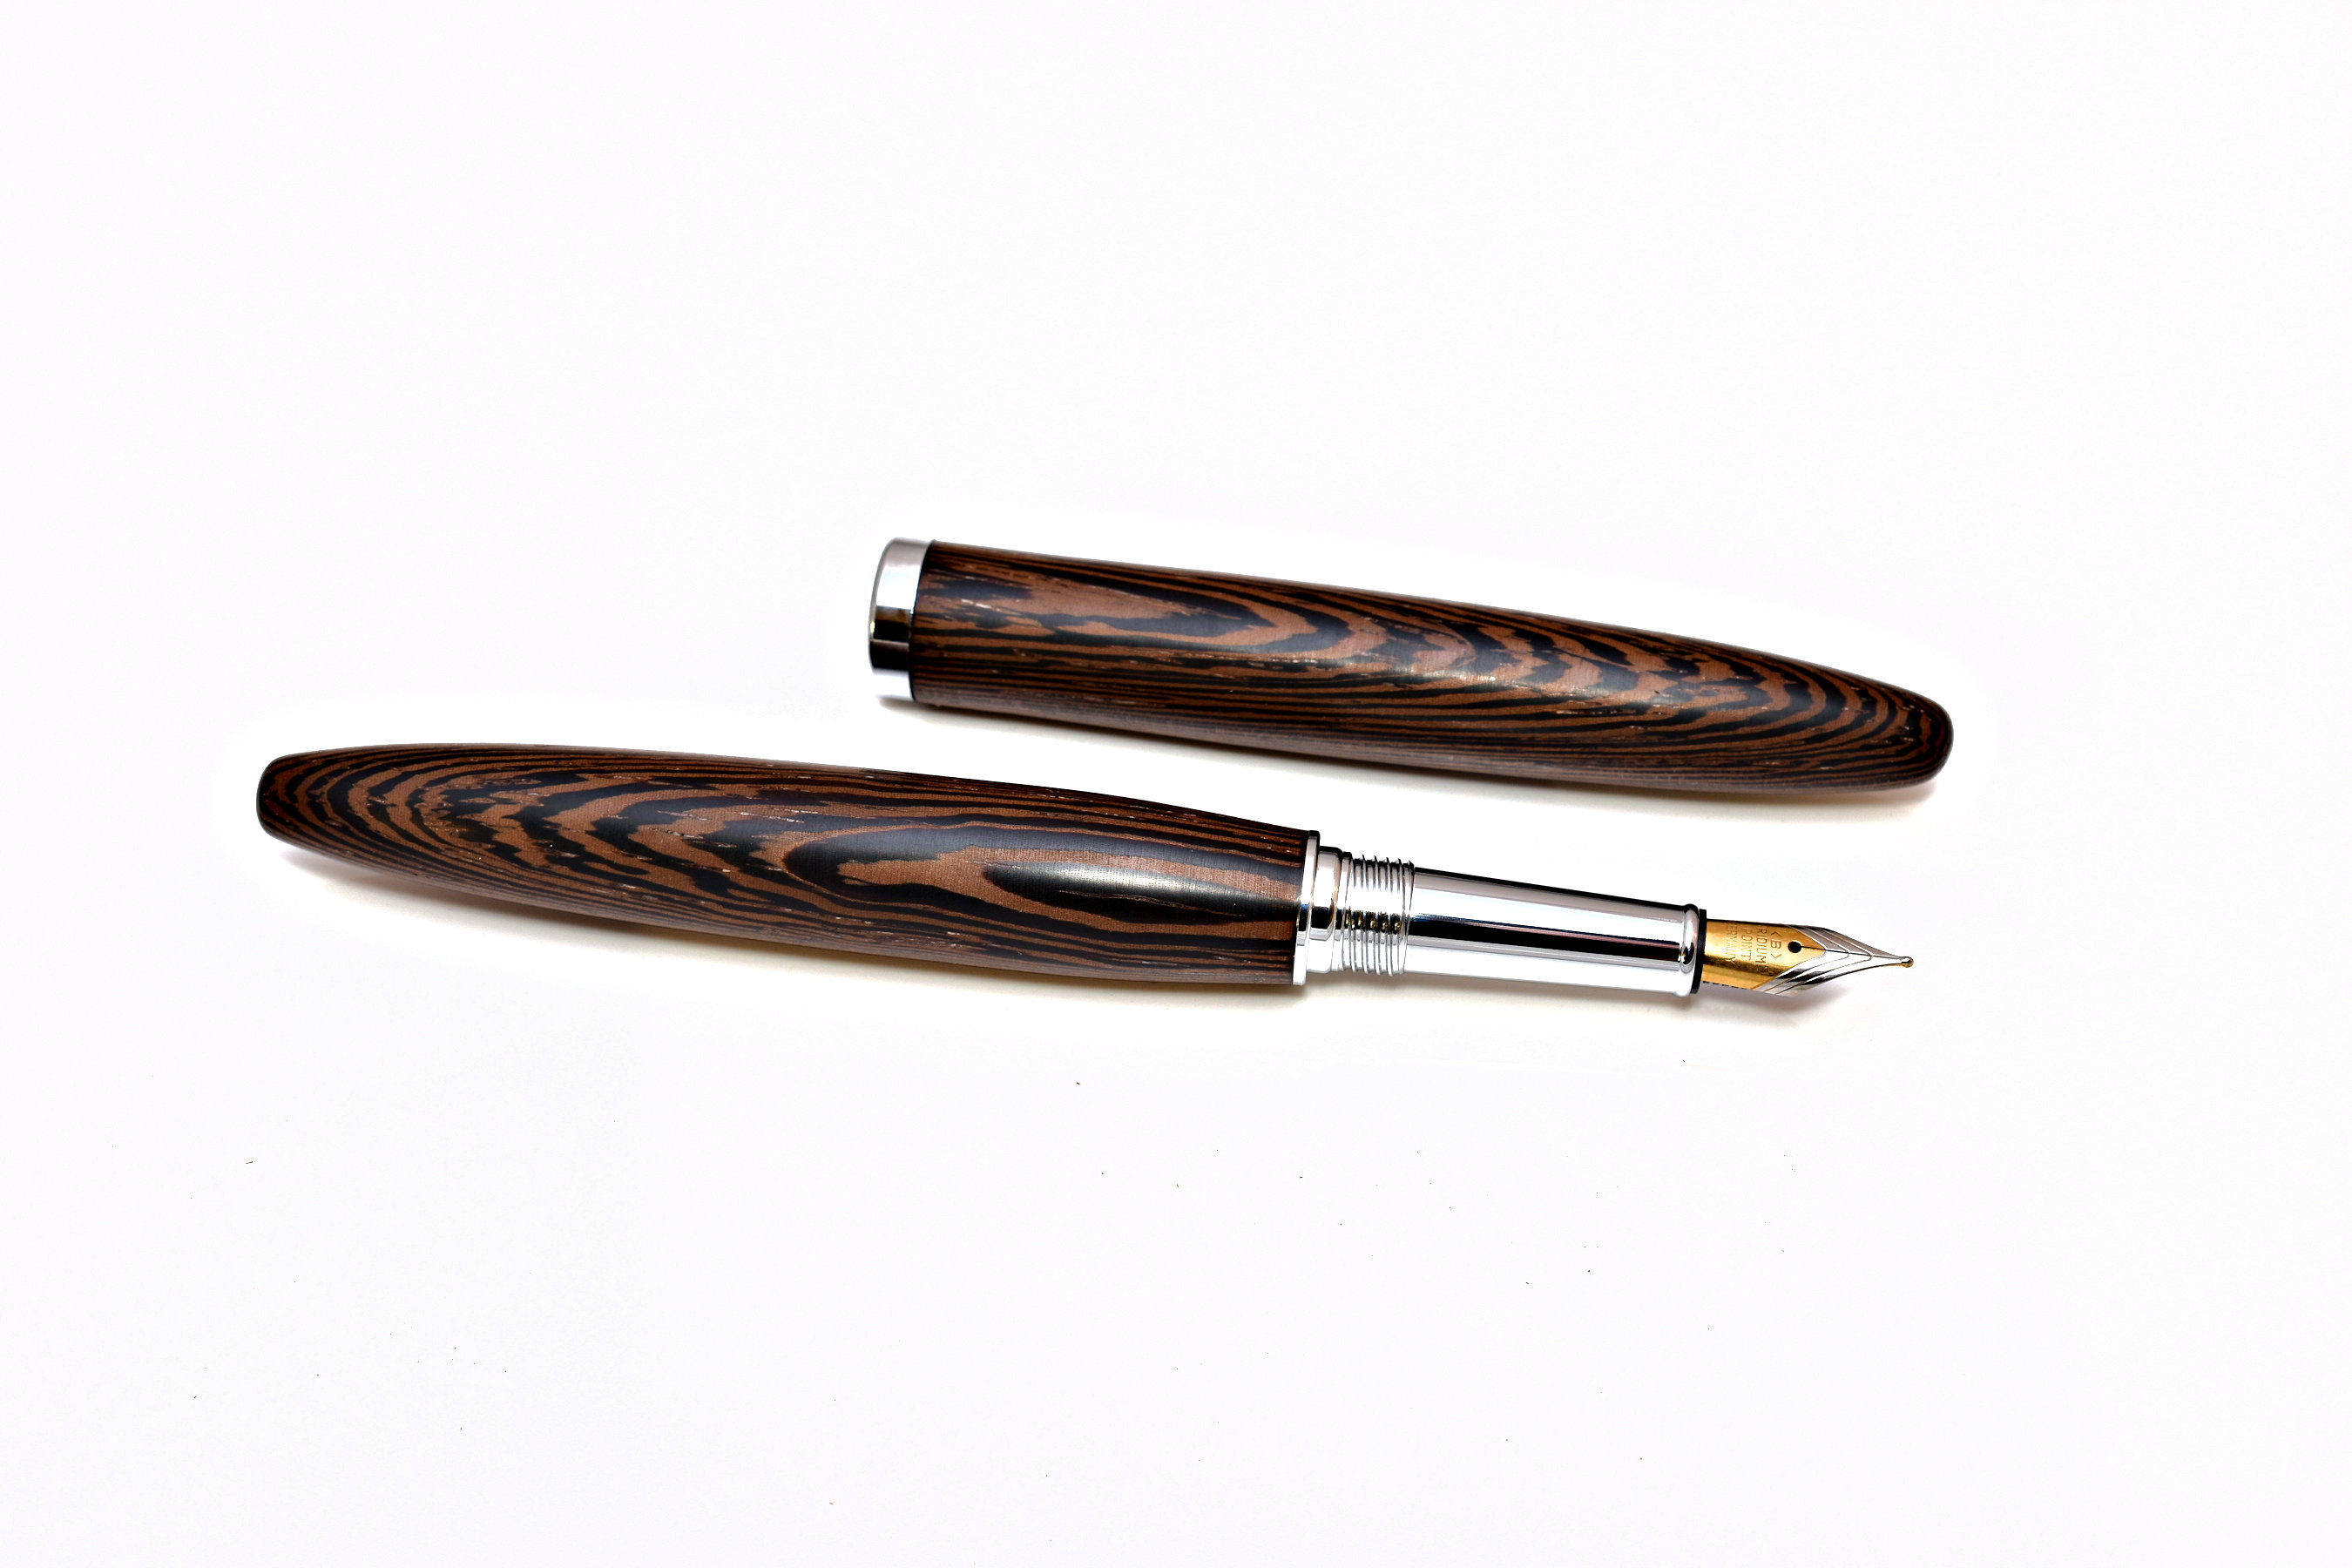 Füller in Zigarenform aus Holz